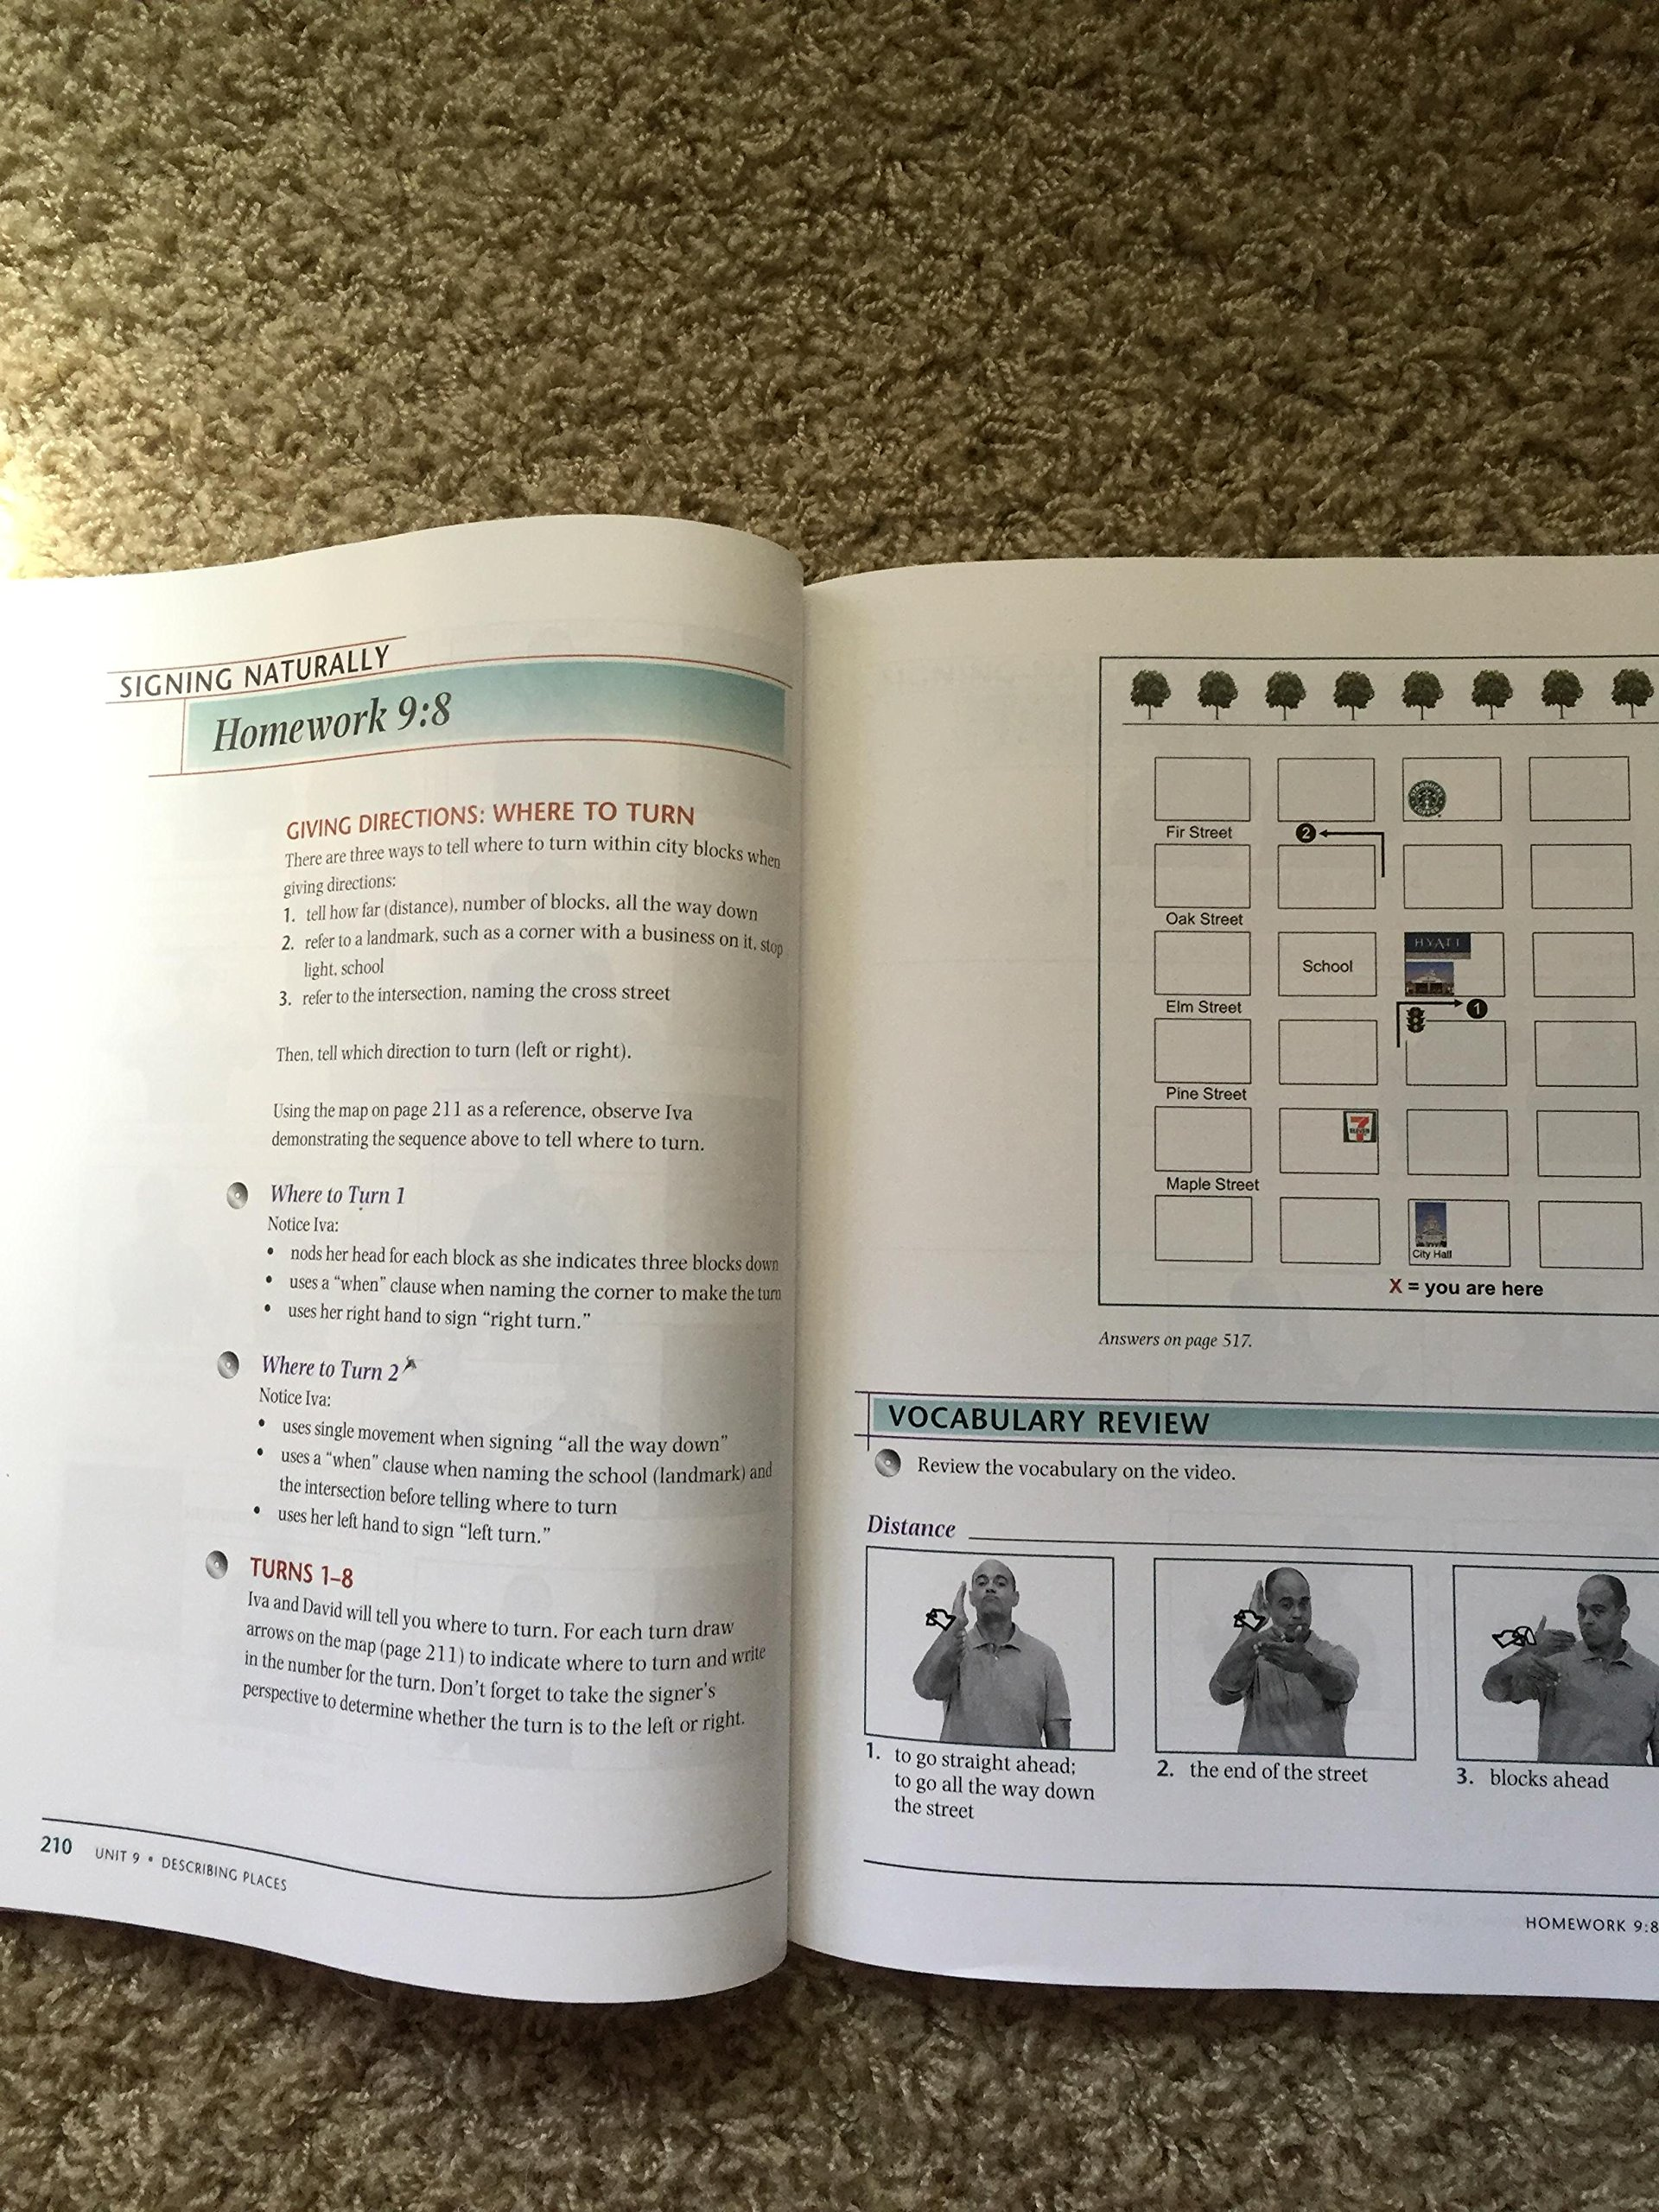 Signing naturally student workbook units 7 12 cheri smith signing naturally student workbook units 7 12 cheri smith 9781581212211 amazon books fandeluxe Images